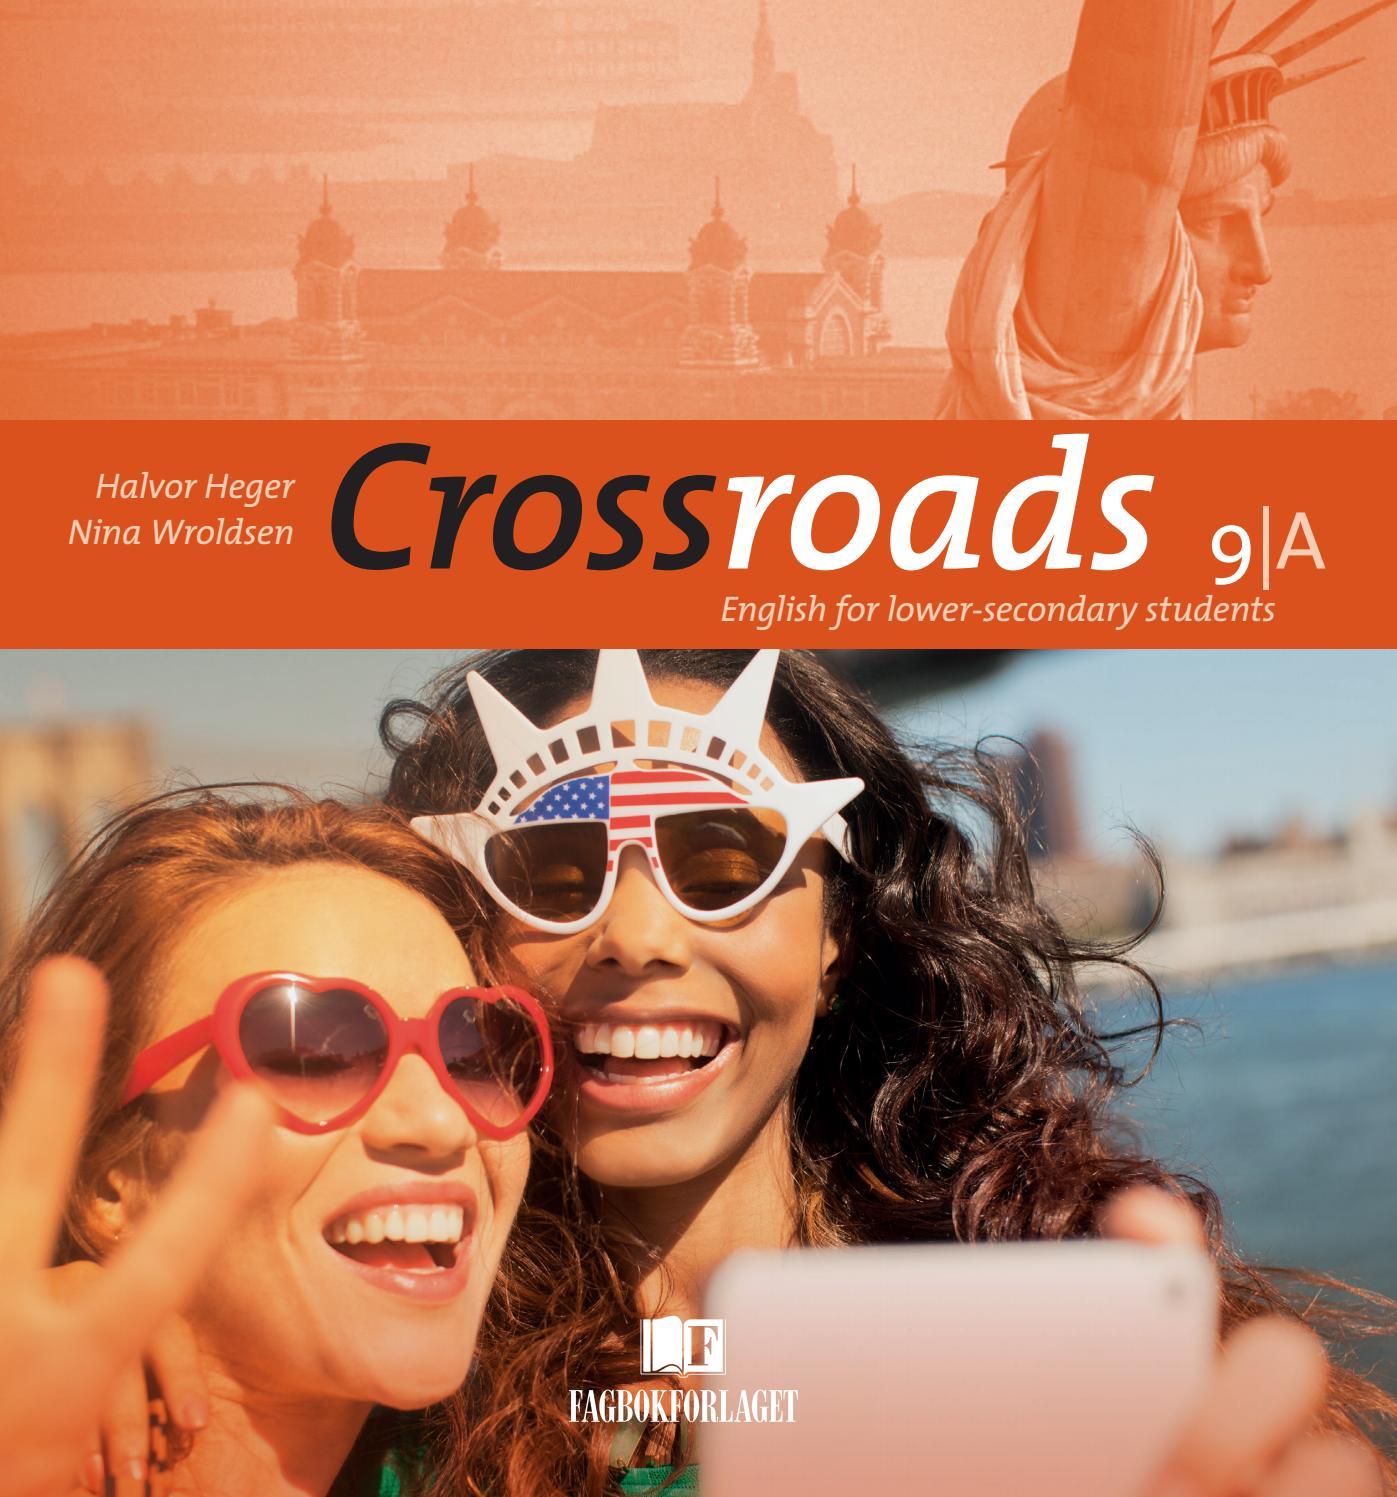 fagbokforlaget docs crossroads a